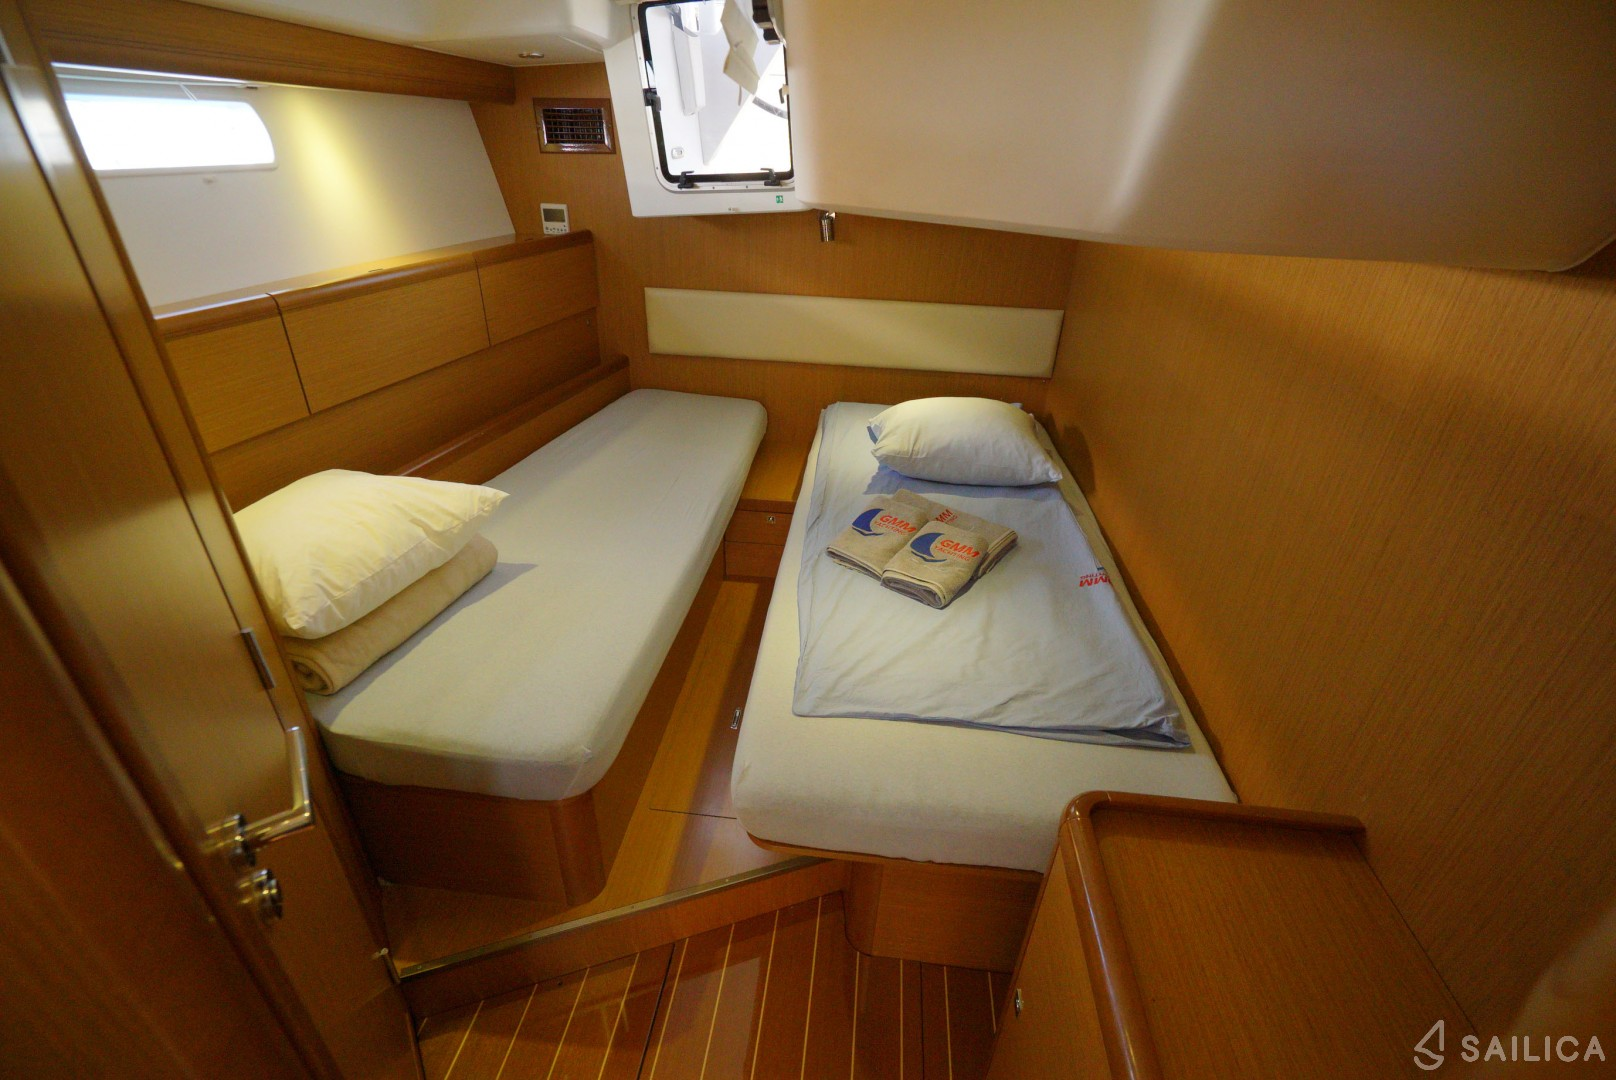 bosun chair rental steel price in pakistan jeanneau 57 for rent marmaris aegean sea